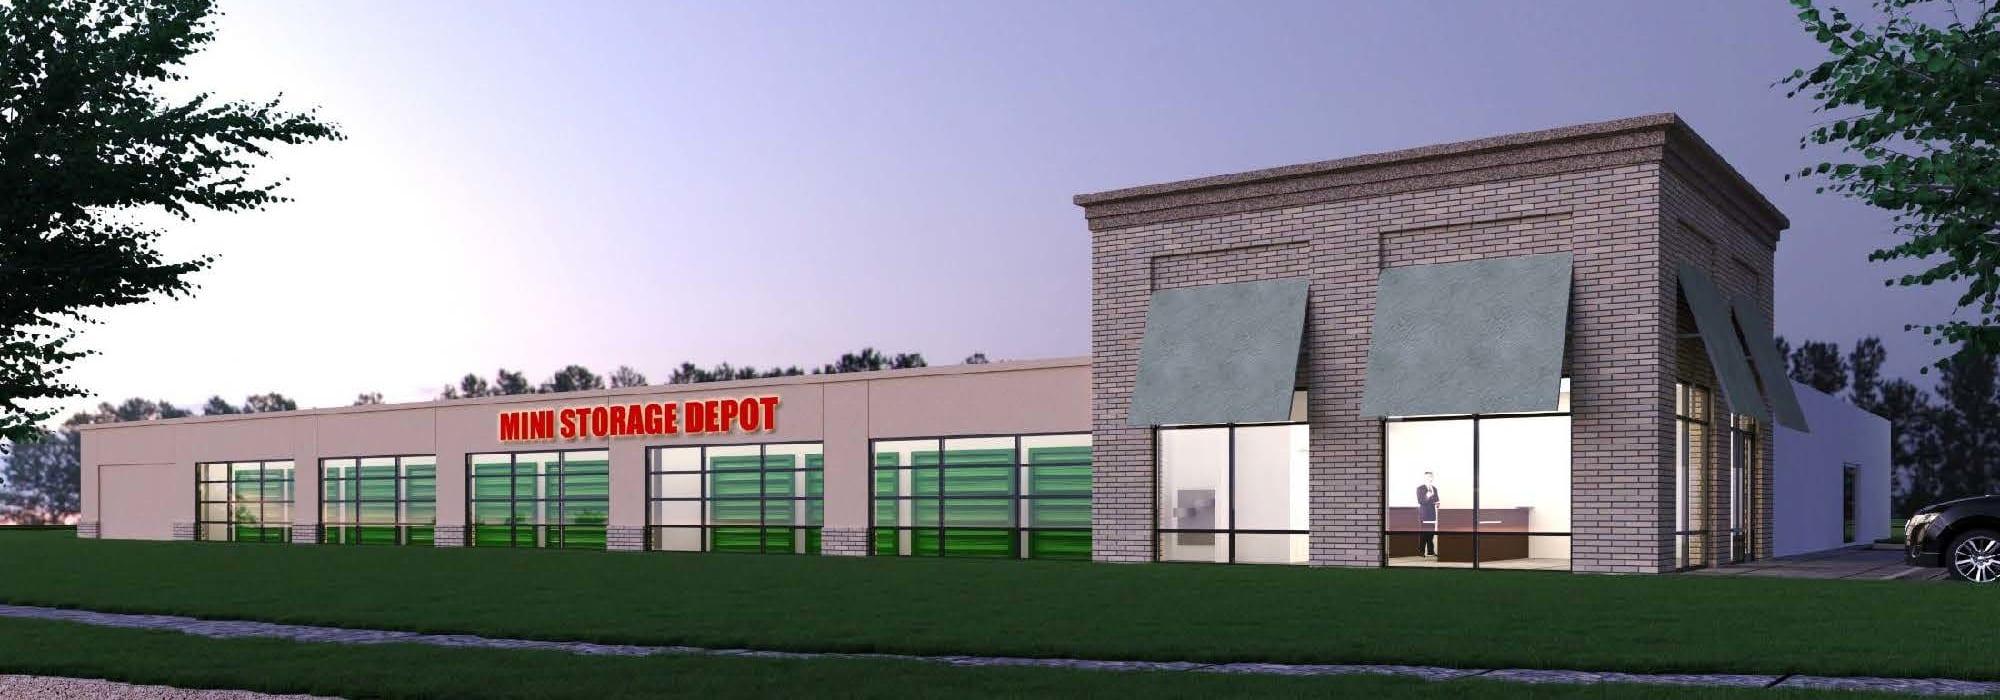 Welcome to Mini Storage Depot in Murfreesboro, Tennessee